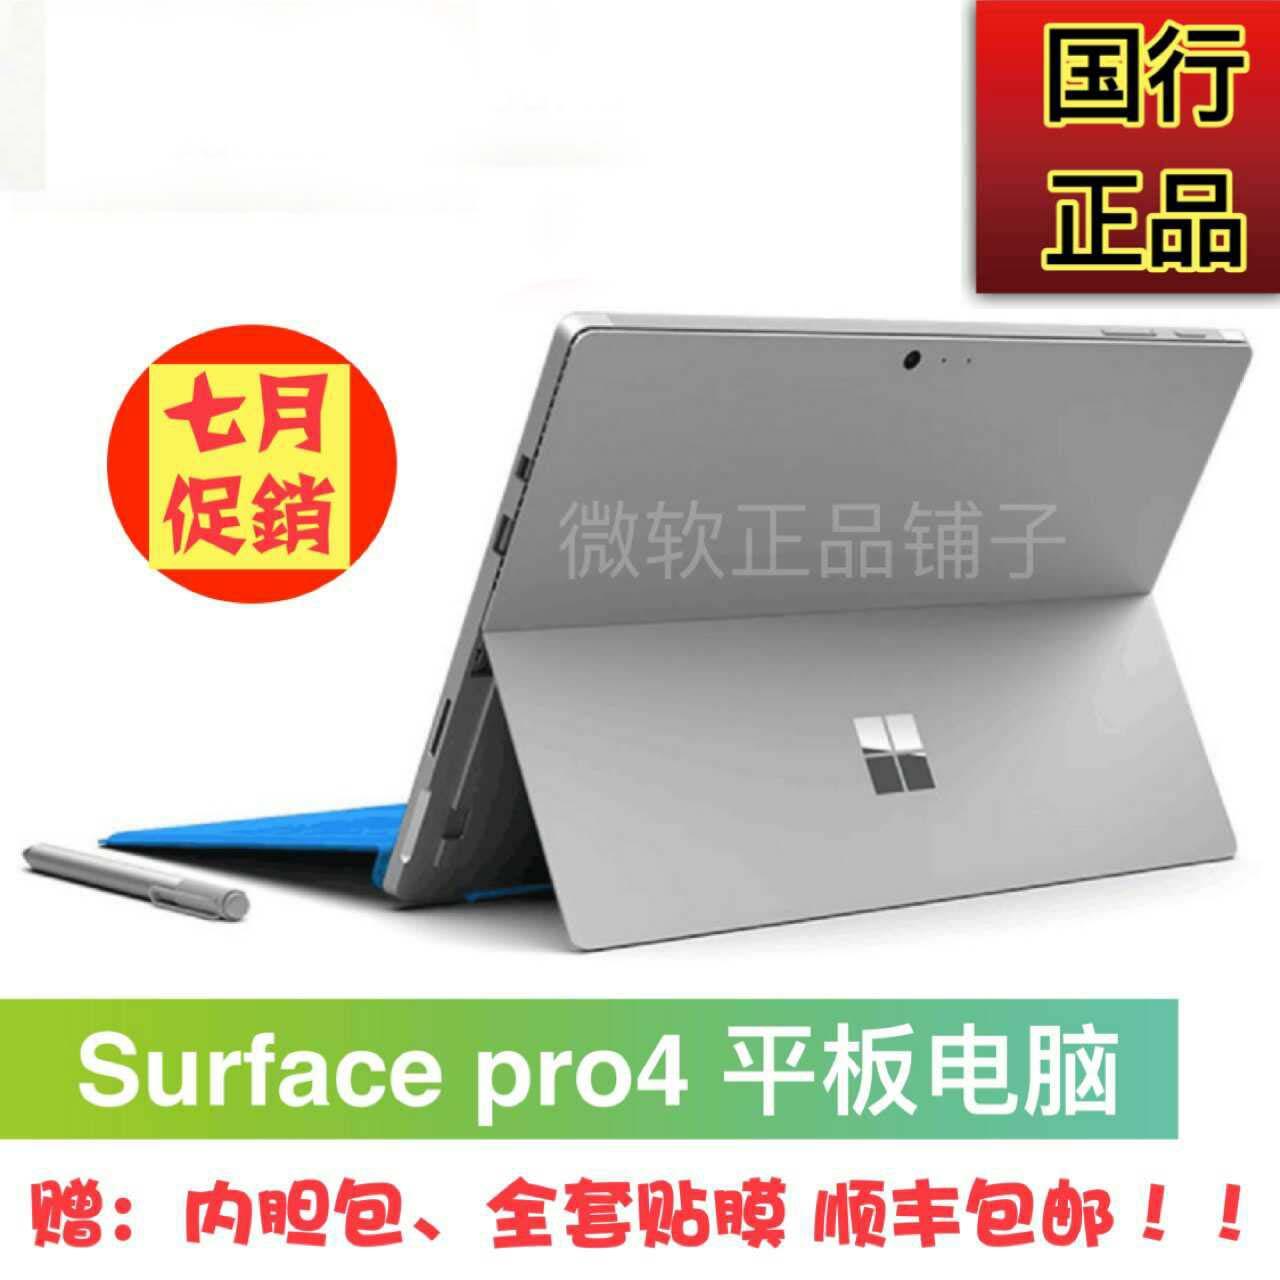 Microsoft/微软 Surface Pro4 256GB i7 Pro 3 平板电脑 国行4g